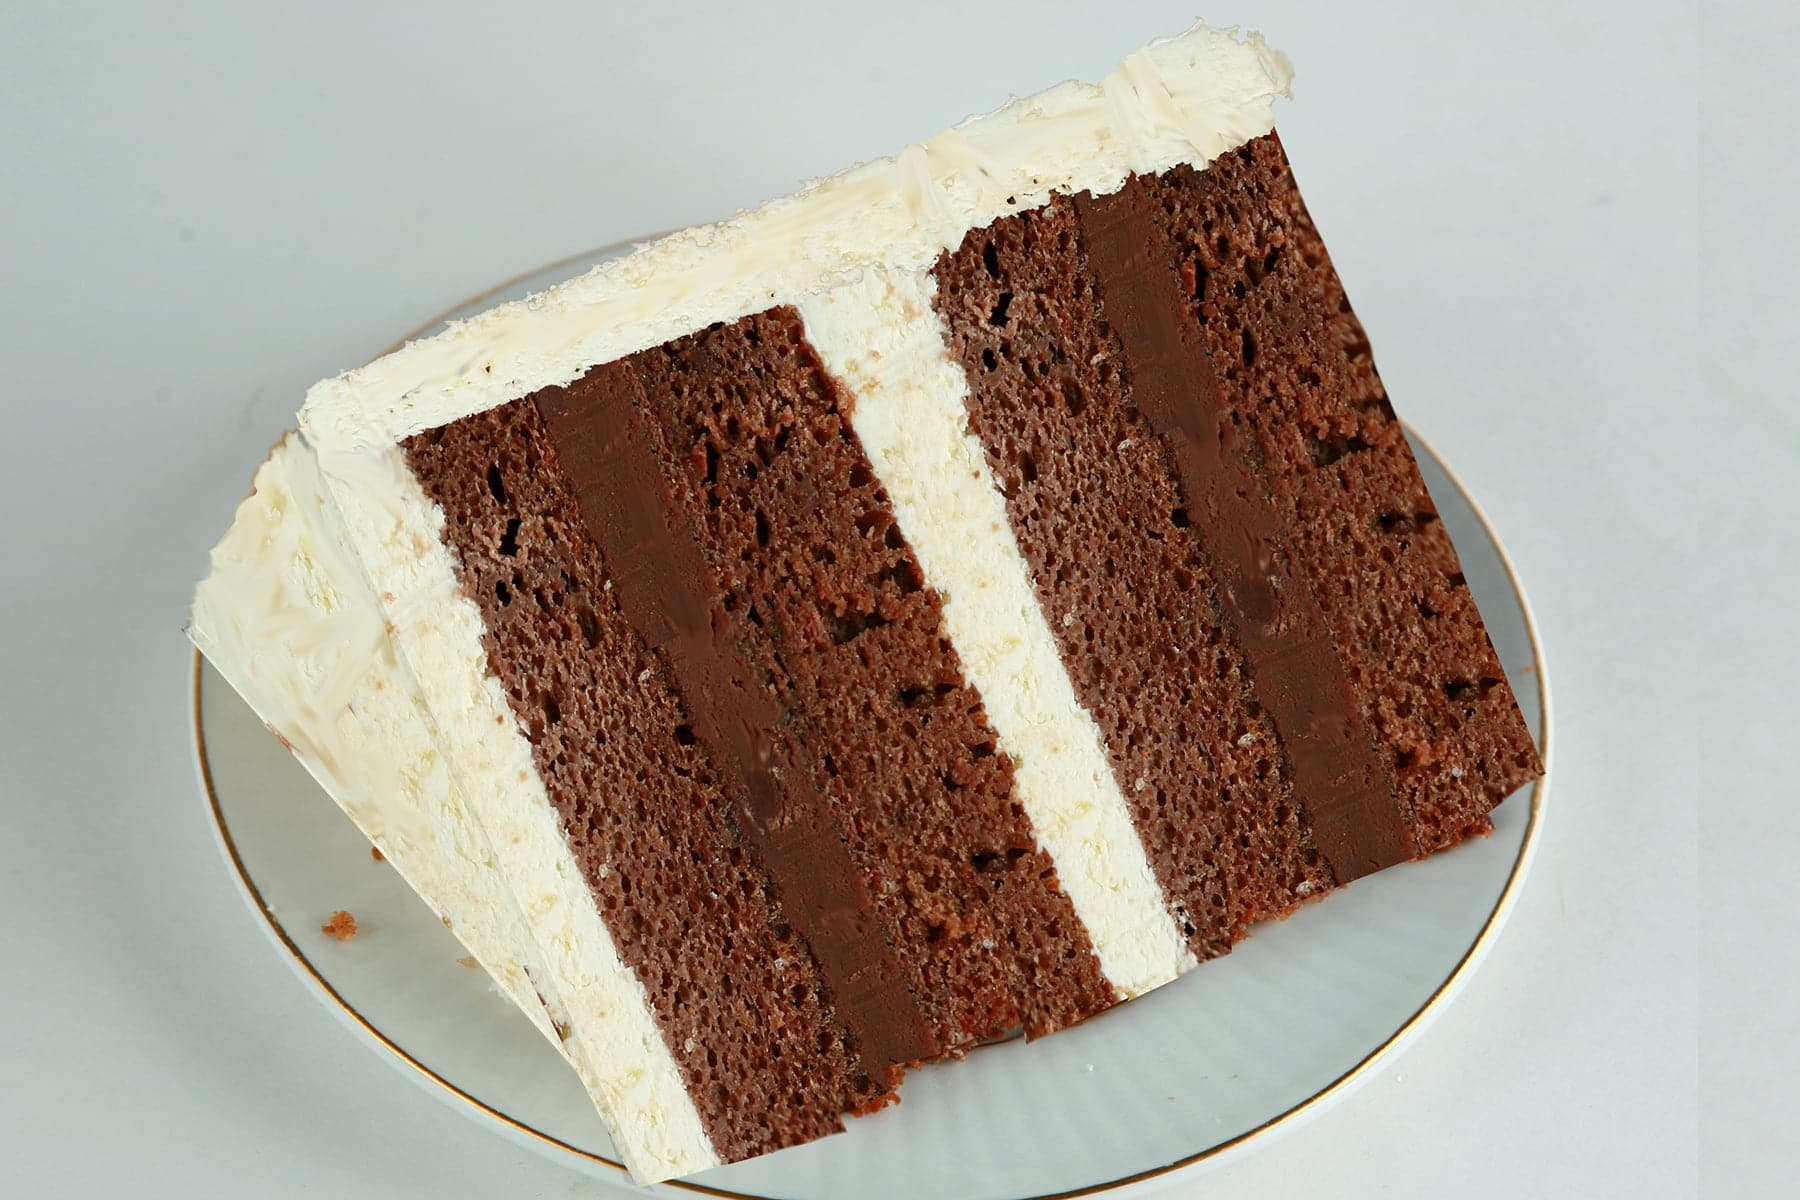 A slice of milk chocolate cardamom pear cake. 4 layers of milk chocolate cake, separated by layers of cardamom ganache and pear buttercream.